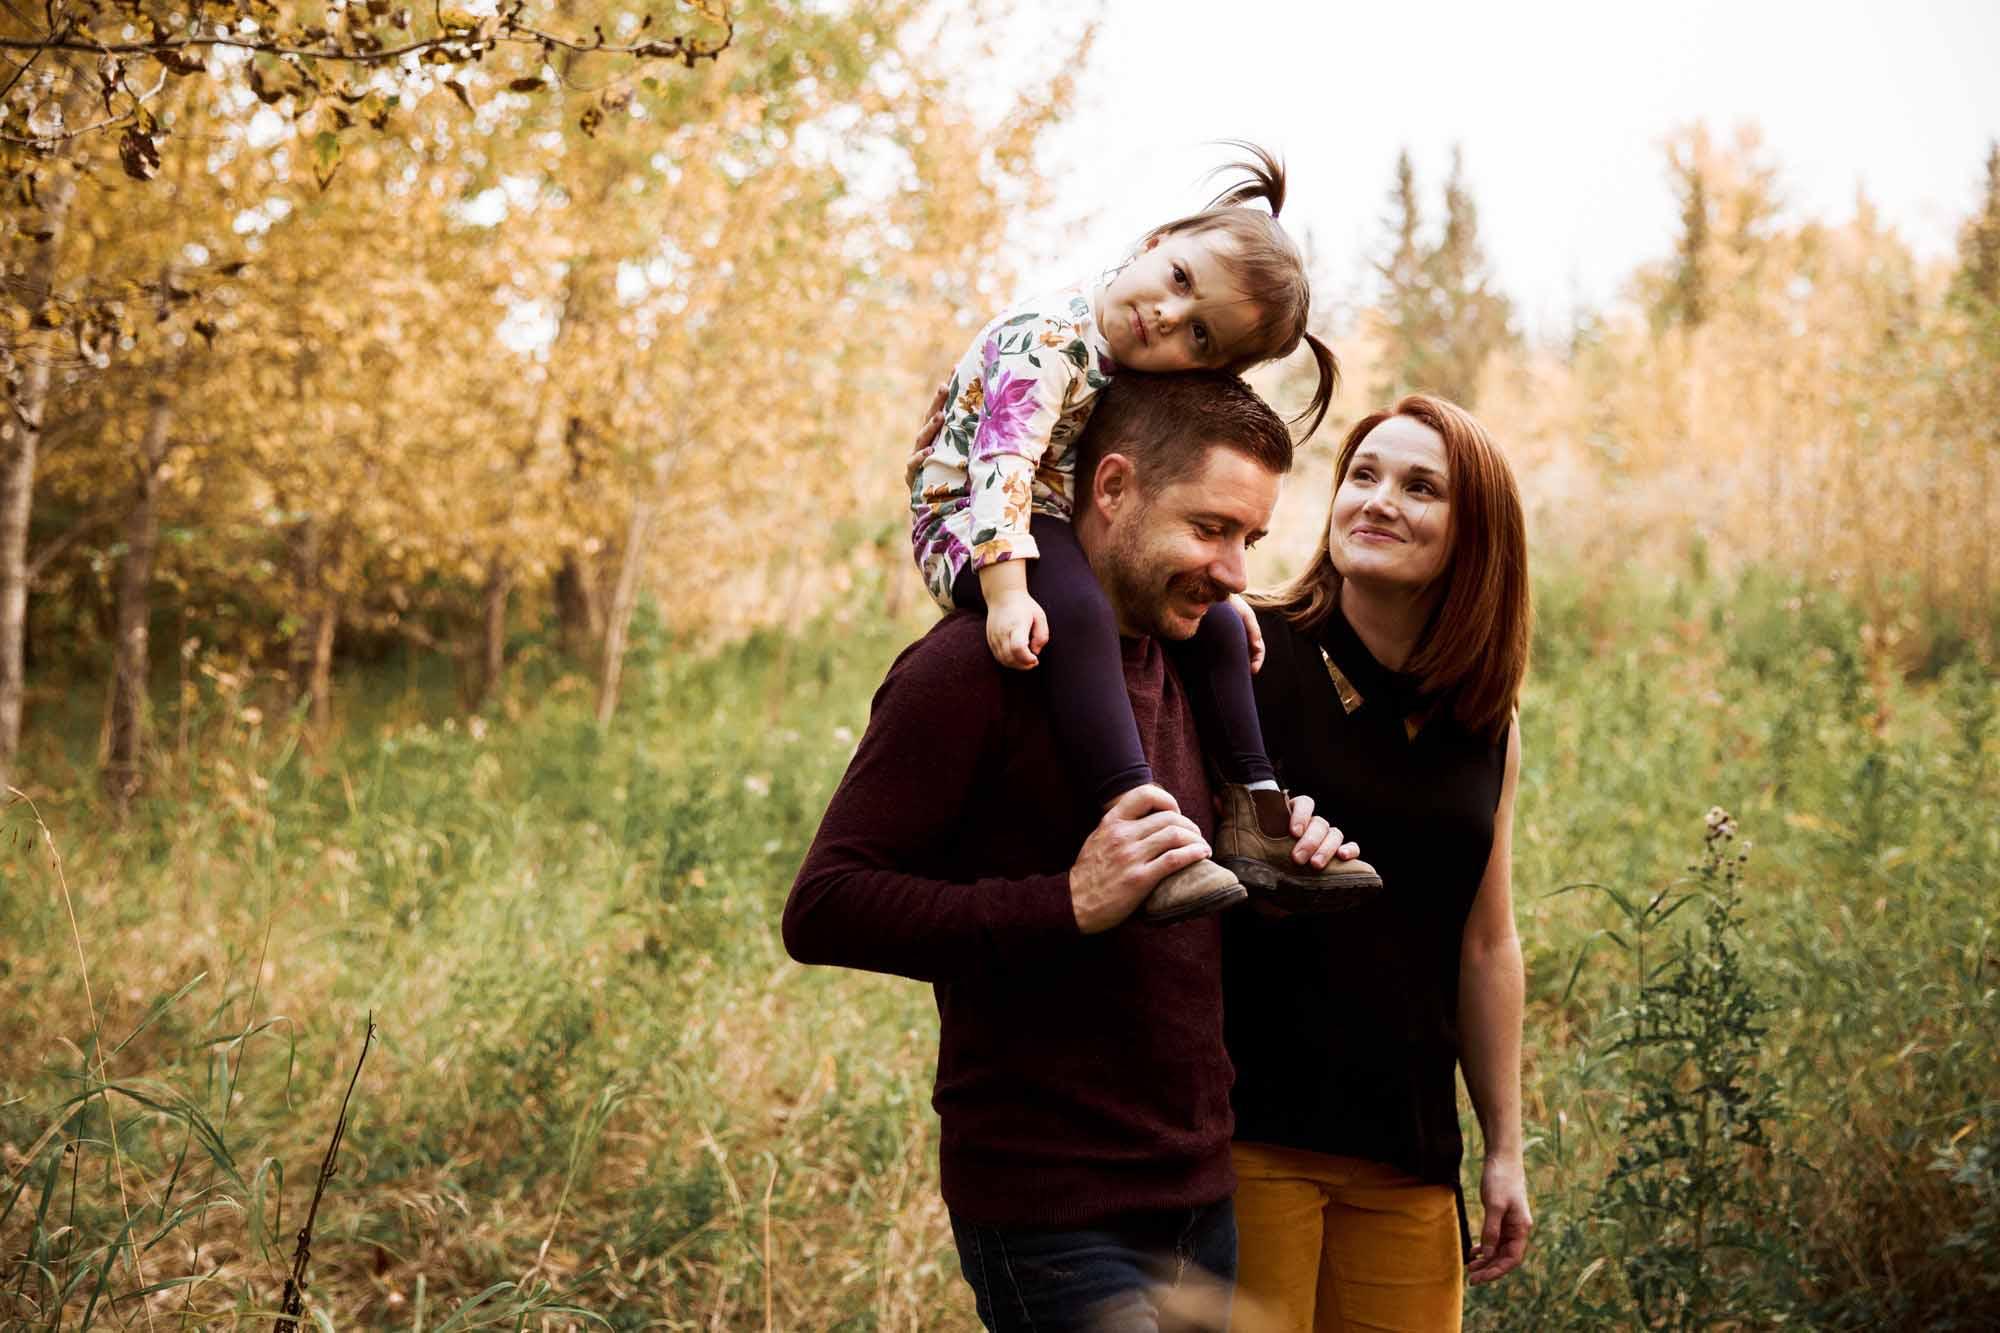 Calgary family, newborn and maternity photographer, fall family photos at Fish Creek Park